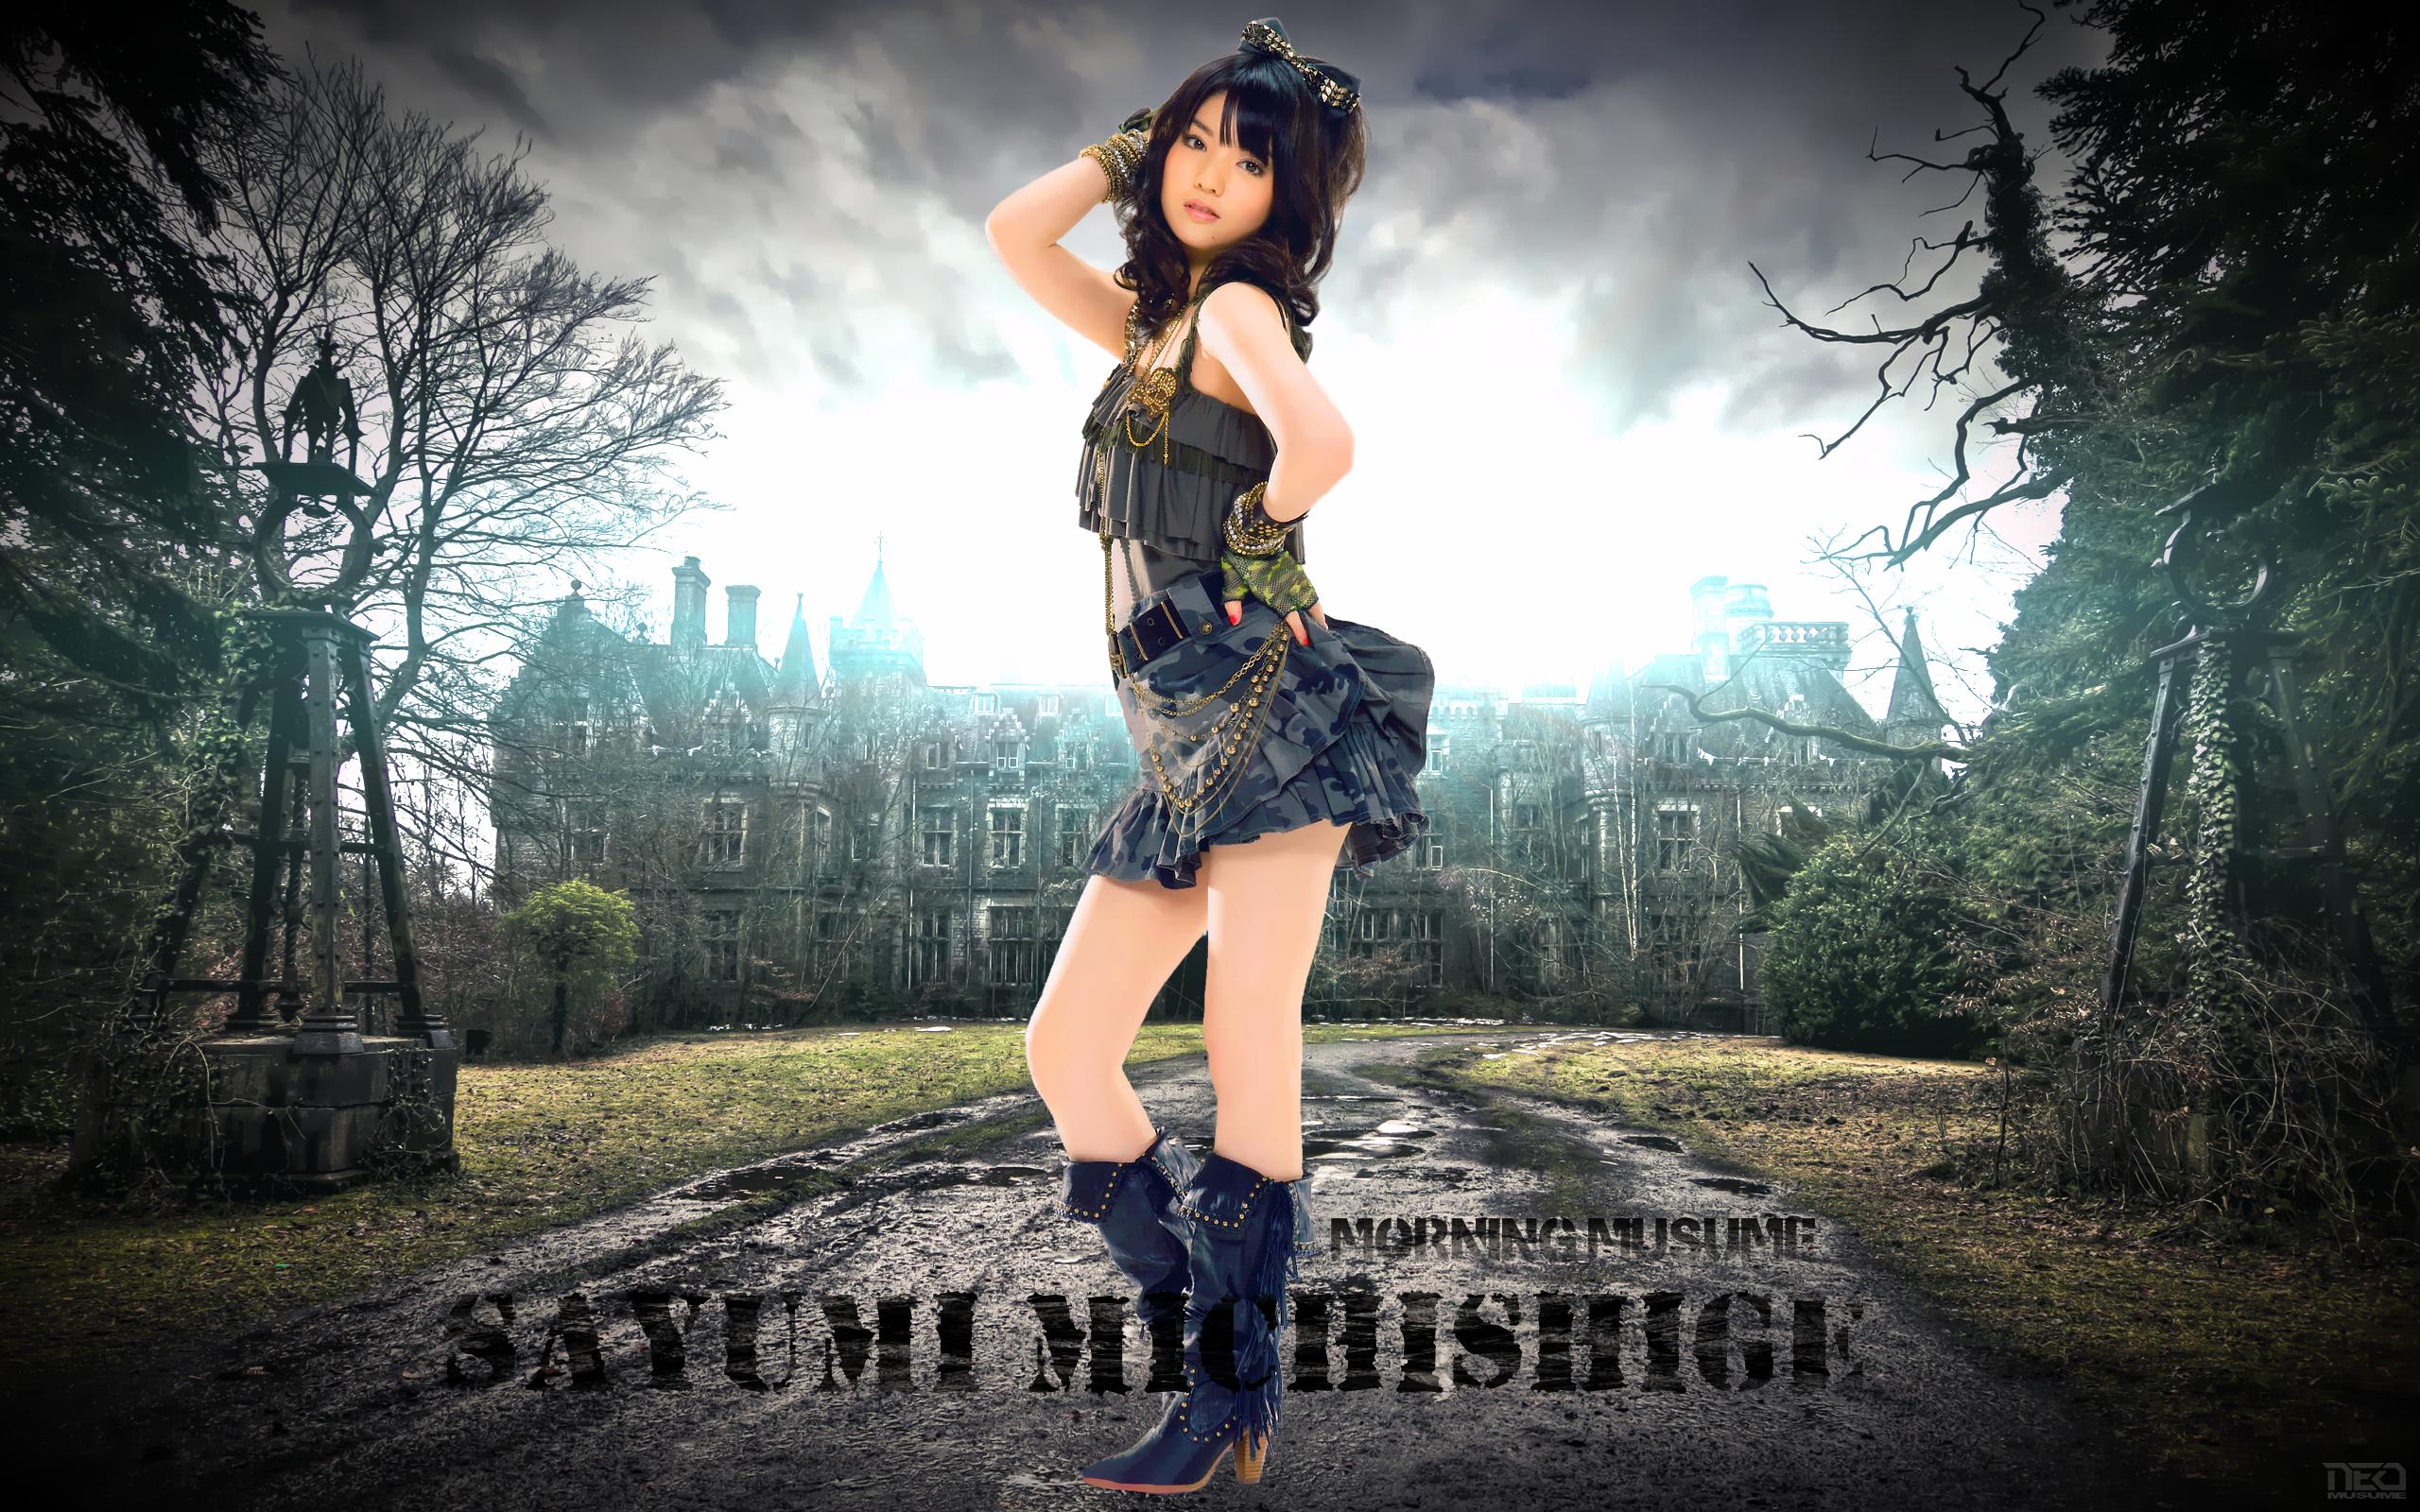 Sayumi Warrior by NEO-Musume